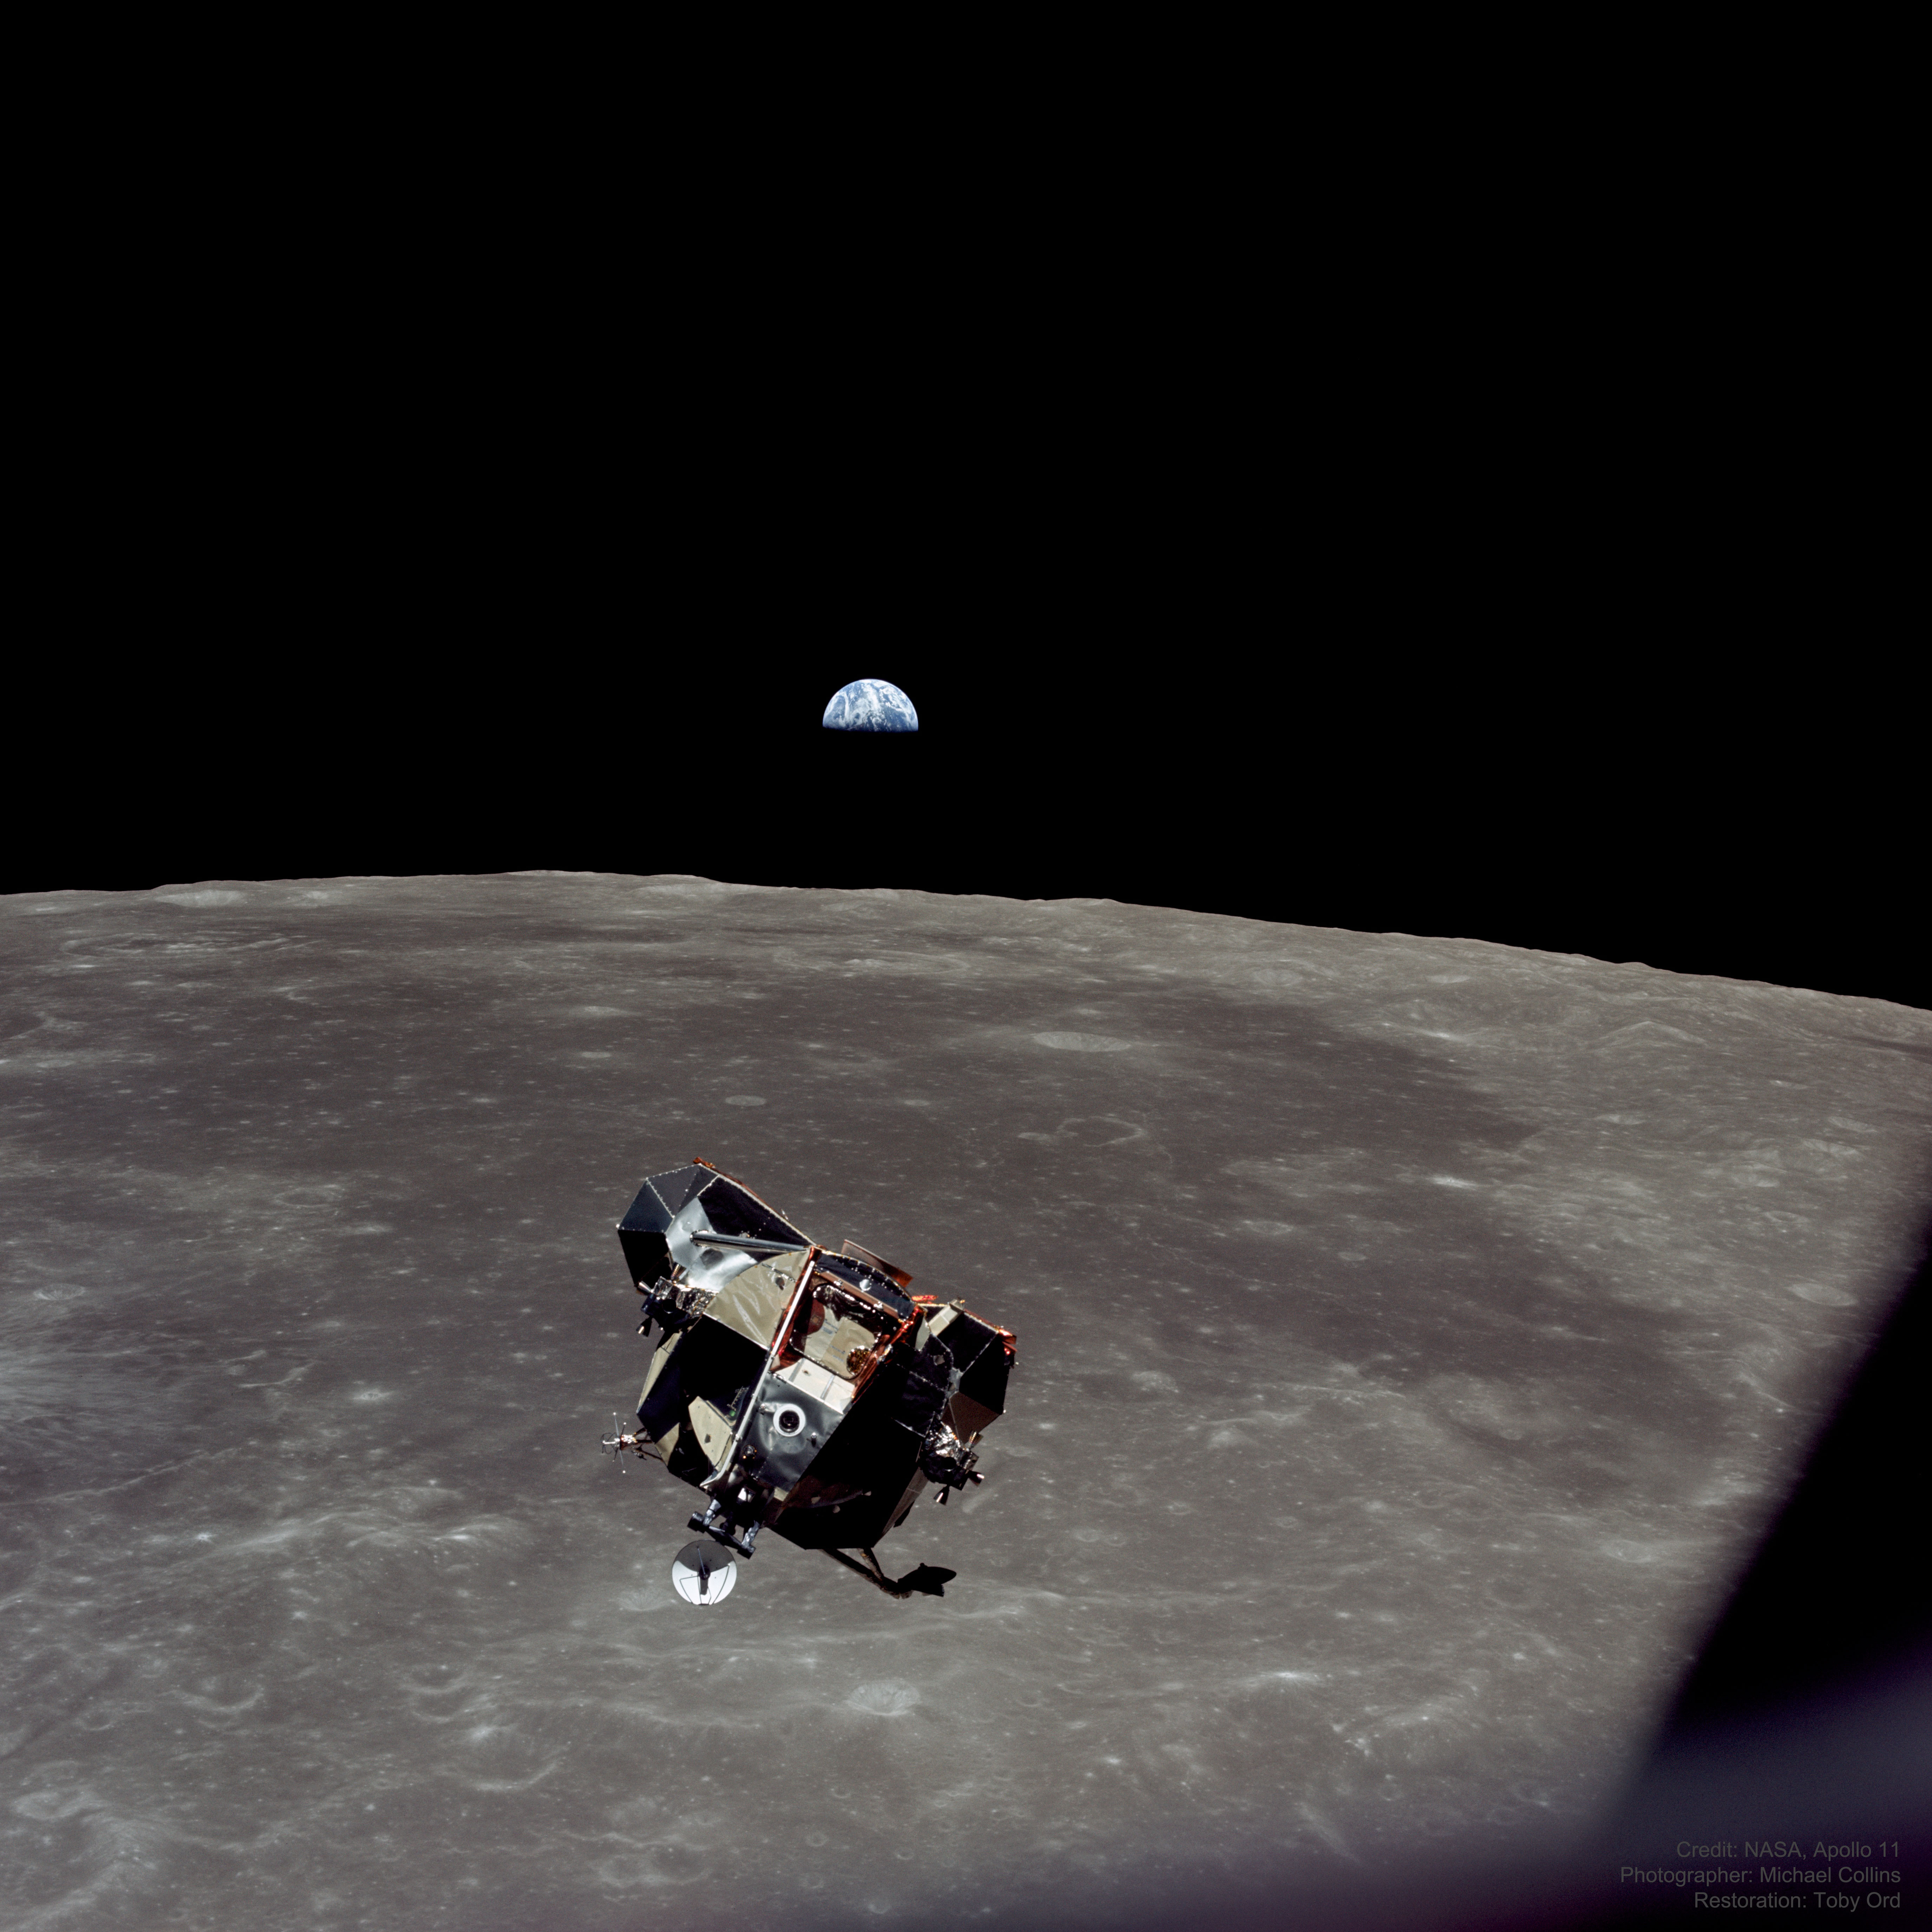 EarthMoonSpaceship_Apollo11Ord_5500